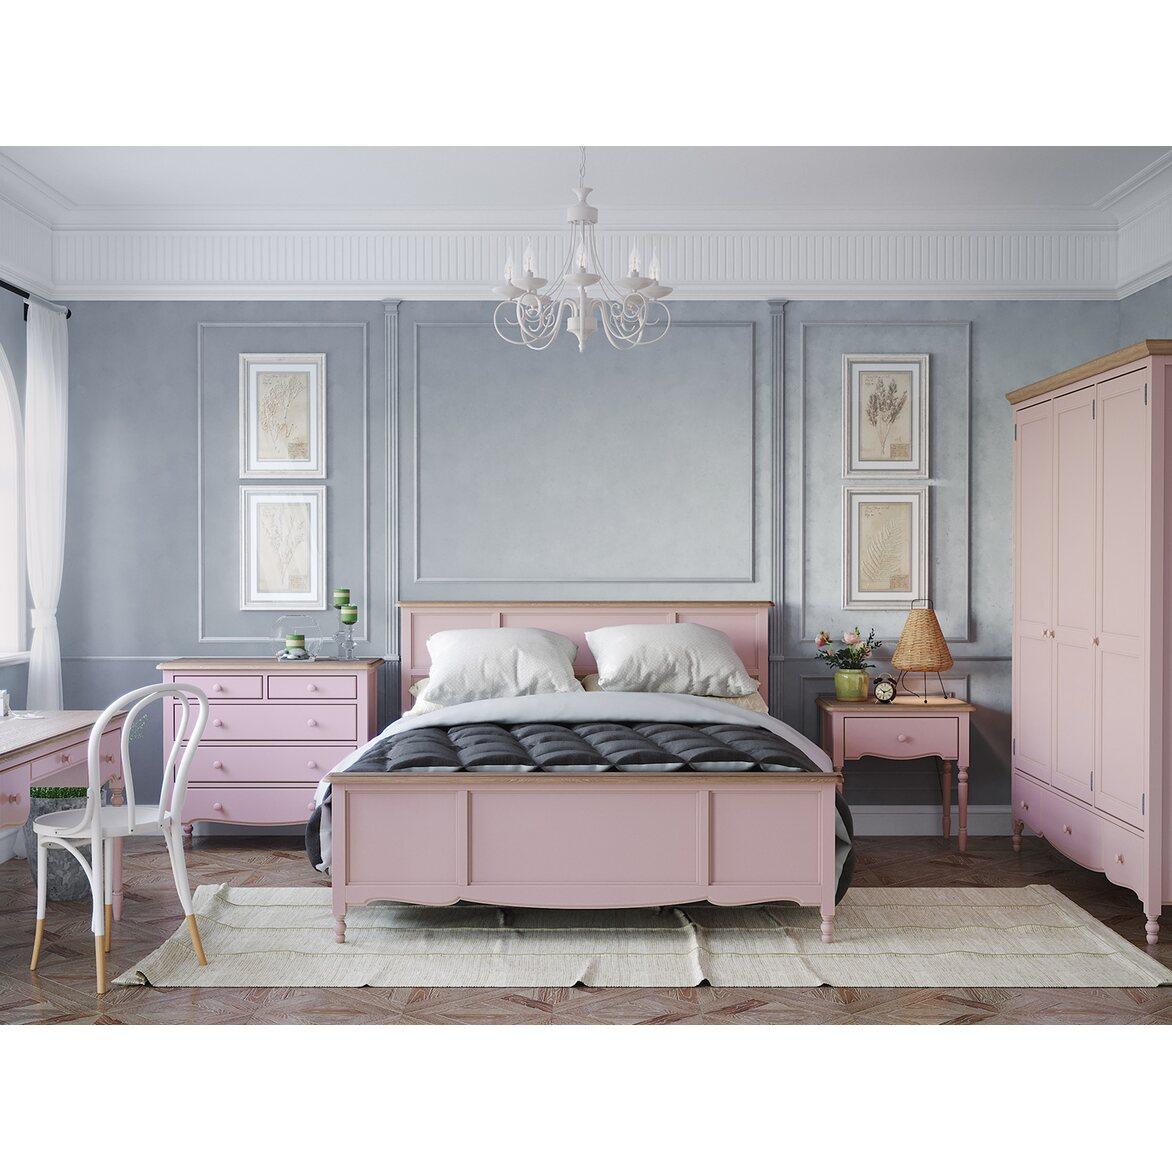 Кровать двуспальная 160*200 Leblanc, лаванда 3 | Двуспальные кровати Kingsby